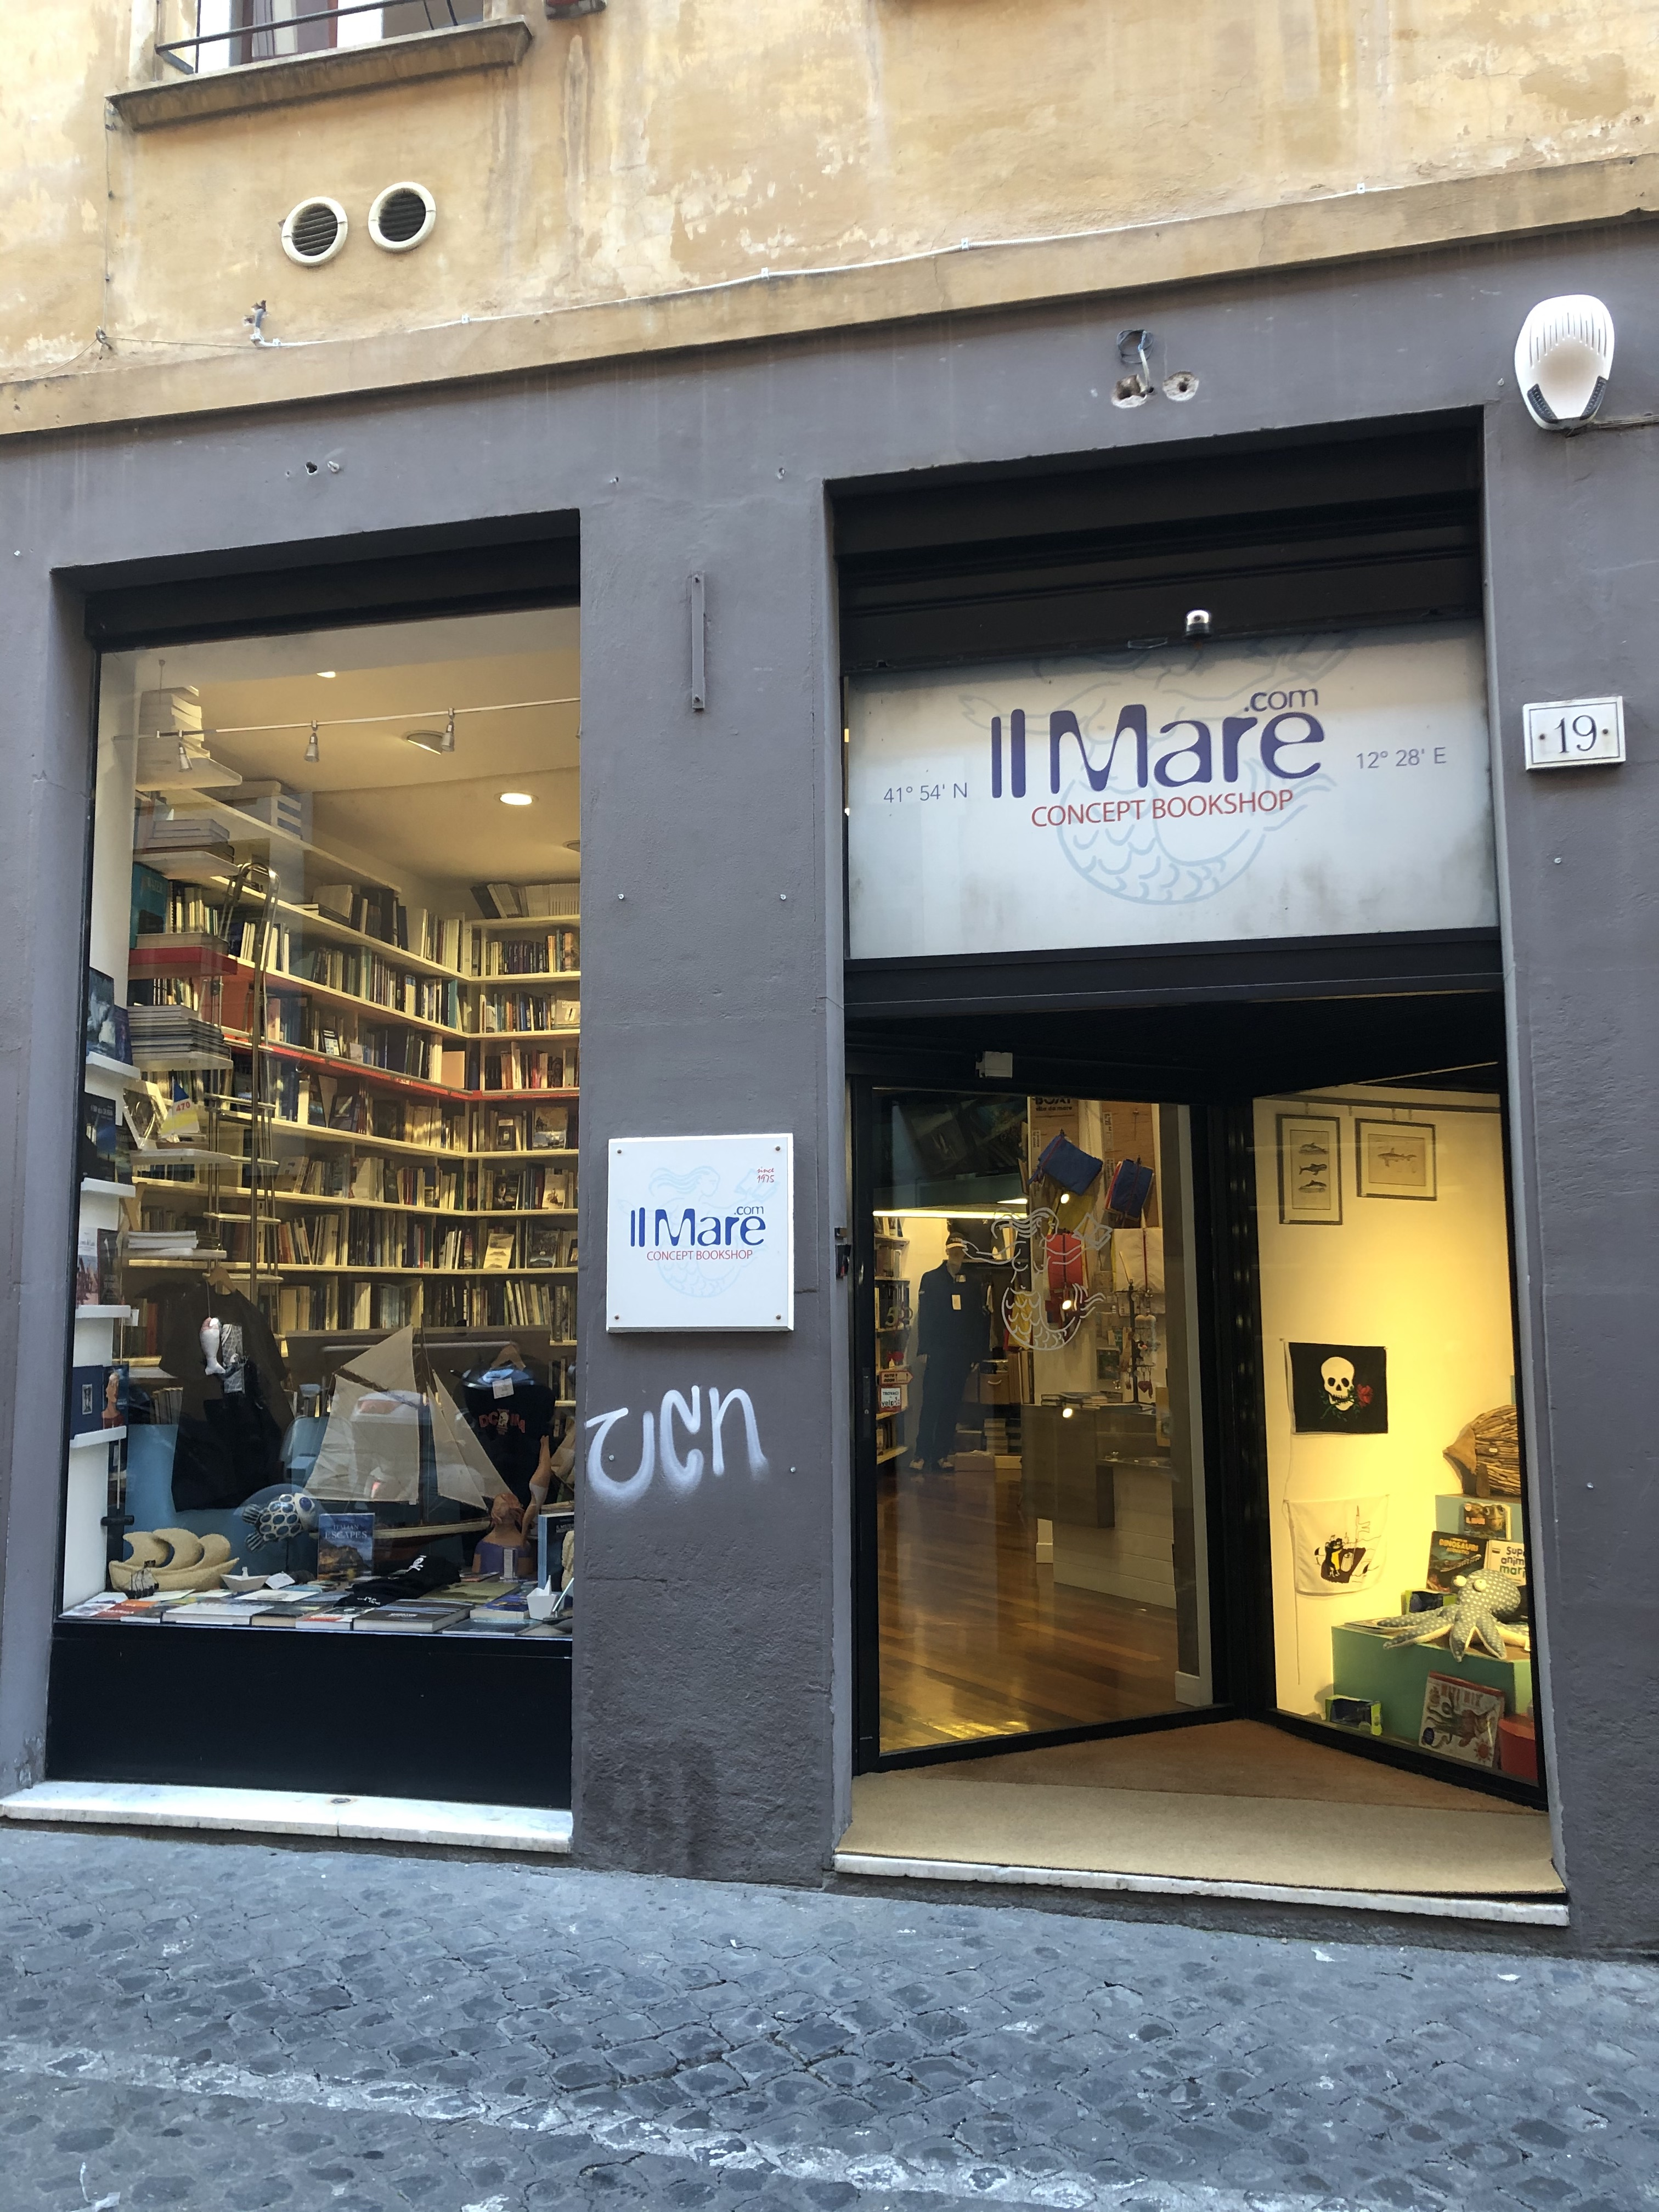 Libreria Il Marejpg